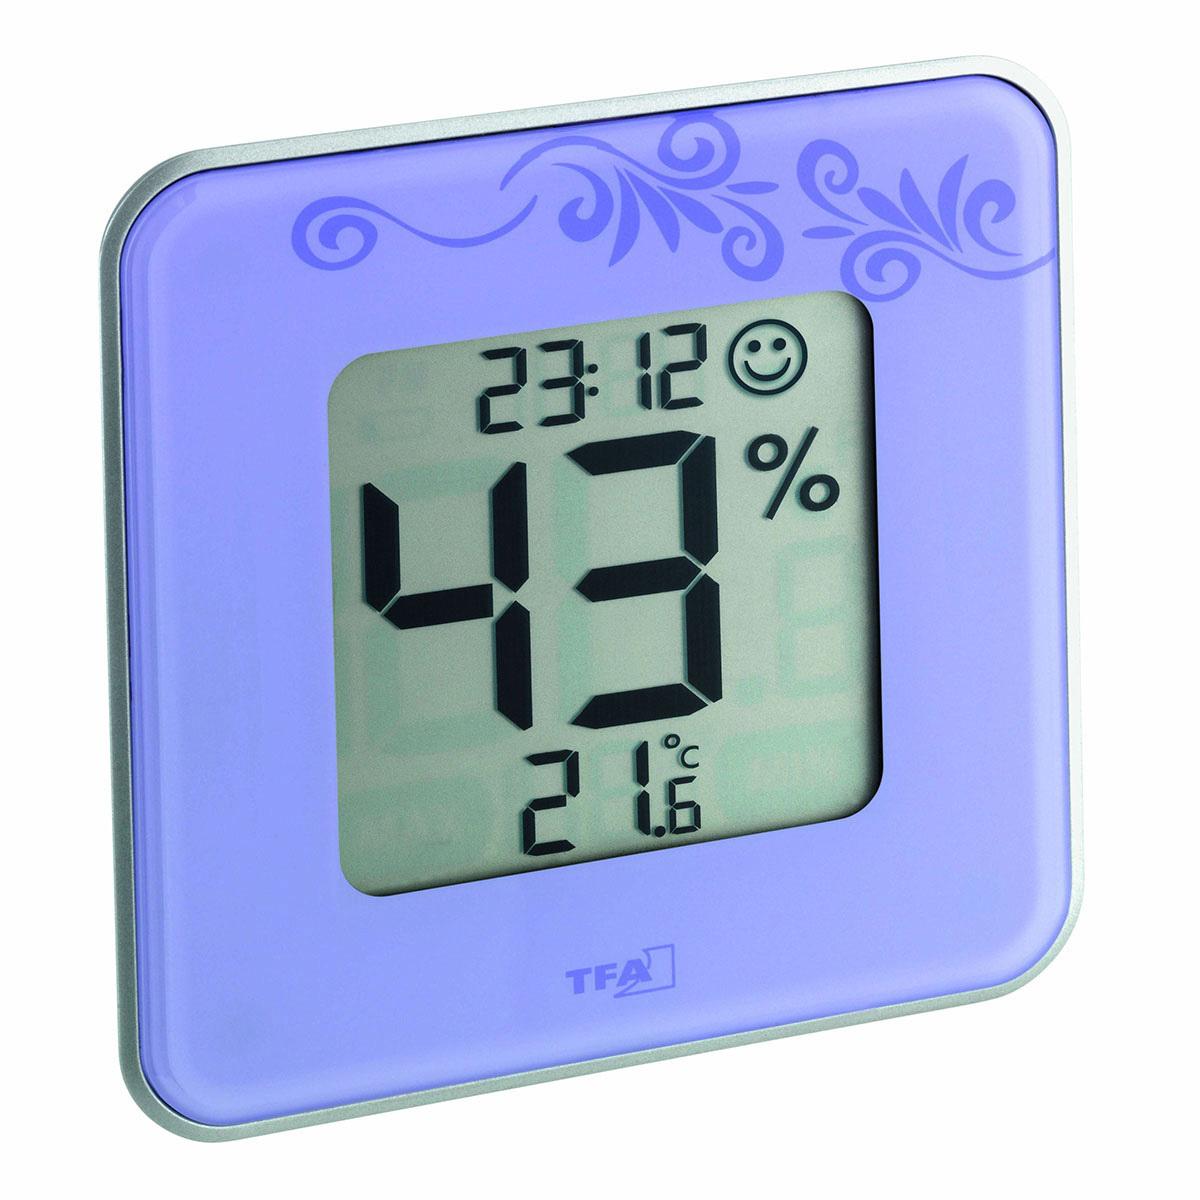 30-5021-11-digitales-thermo-hygrometer-style-ansicht-1200x1200px.jpg